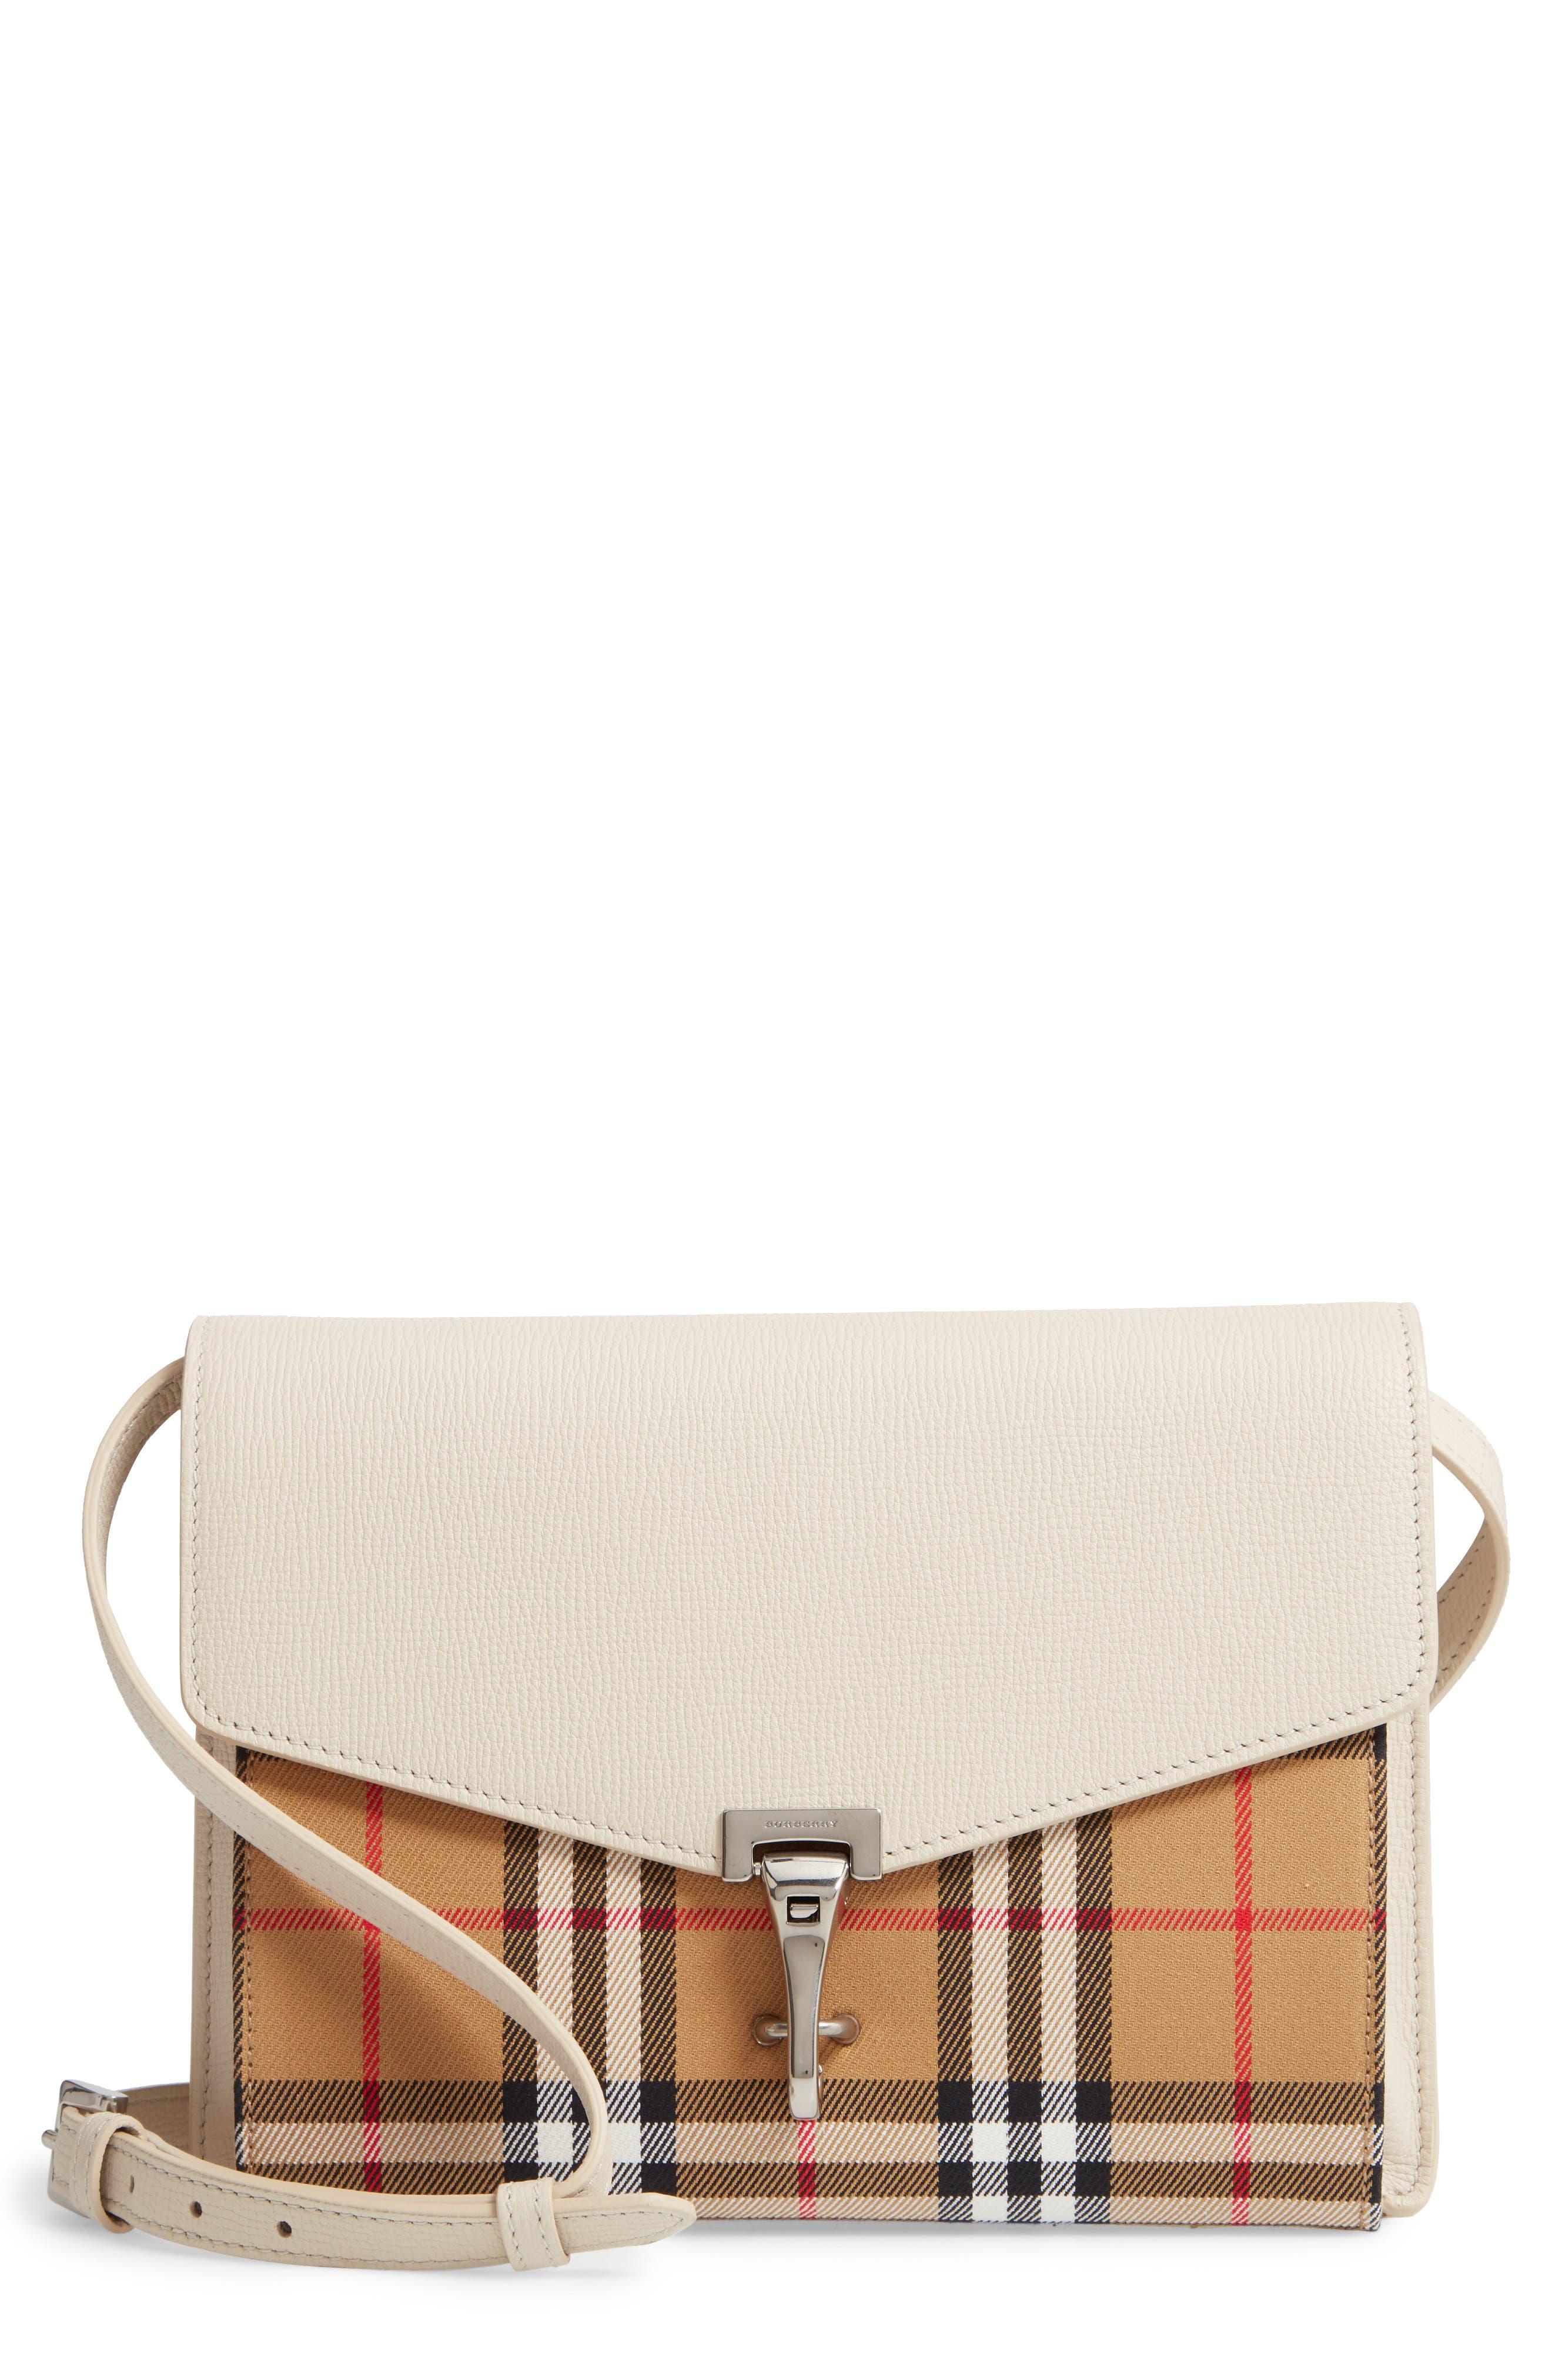 f678b0e48c77 Burberry Small Macken Vintage Check Crossbody Bag - Ivory